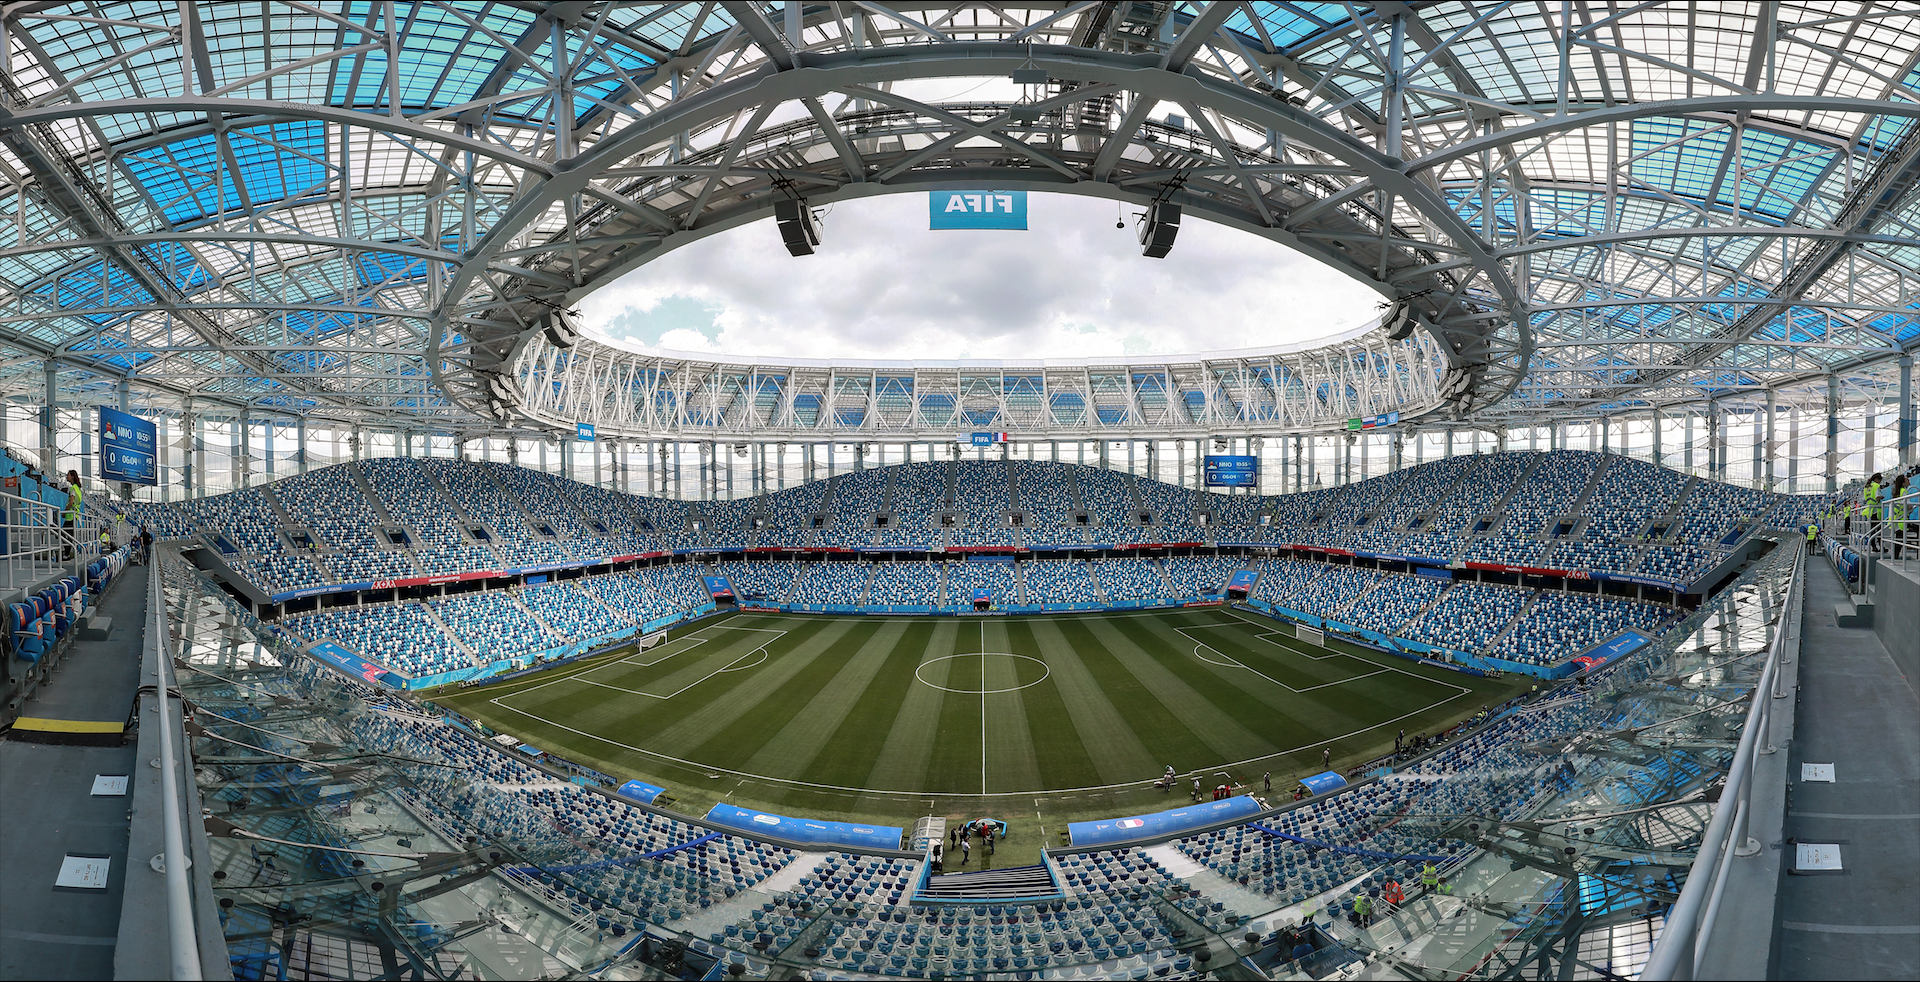 Фото: © РИА Новости / Антон Денисов